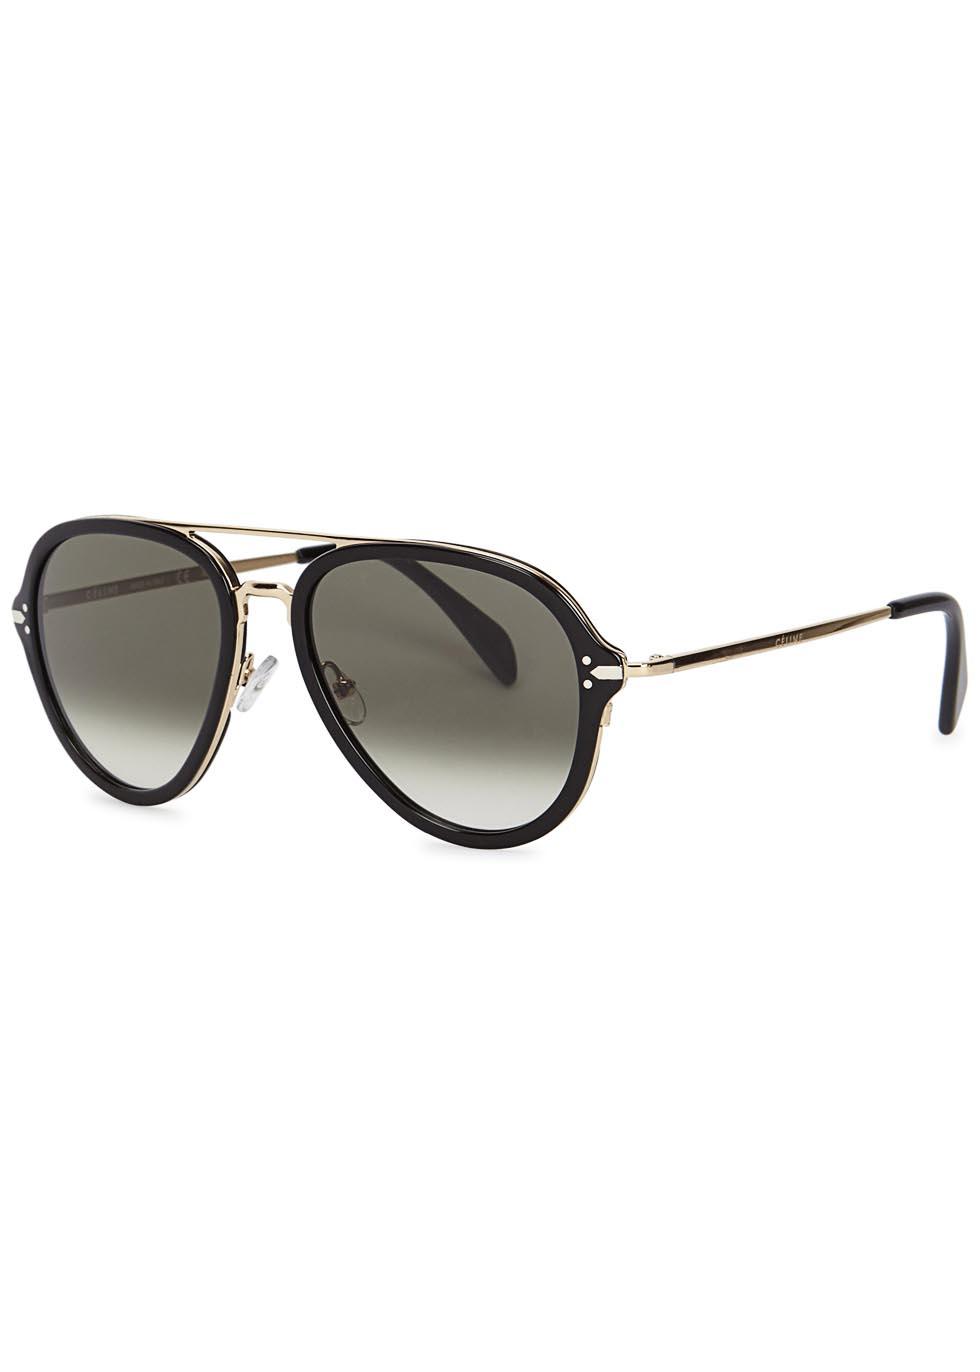 Drop black aviator-style sunglasses - Celine